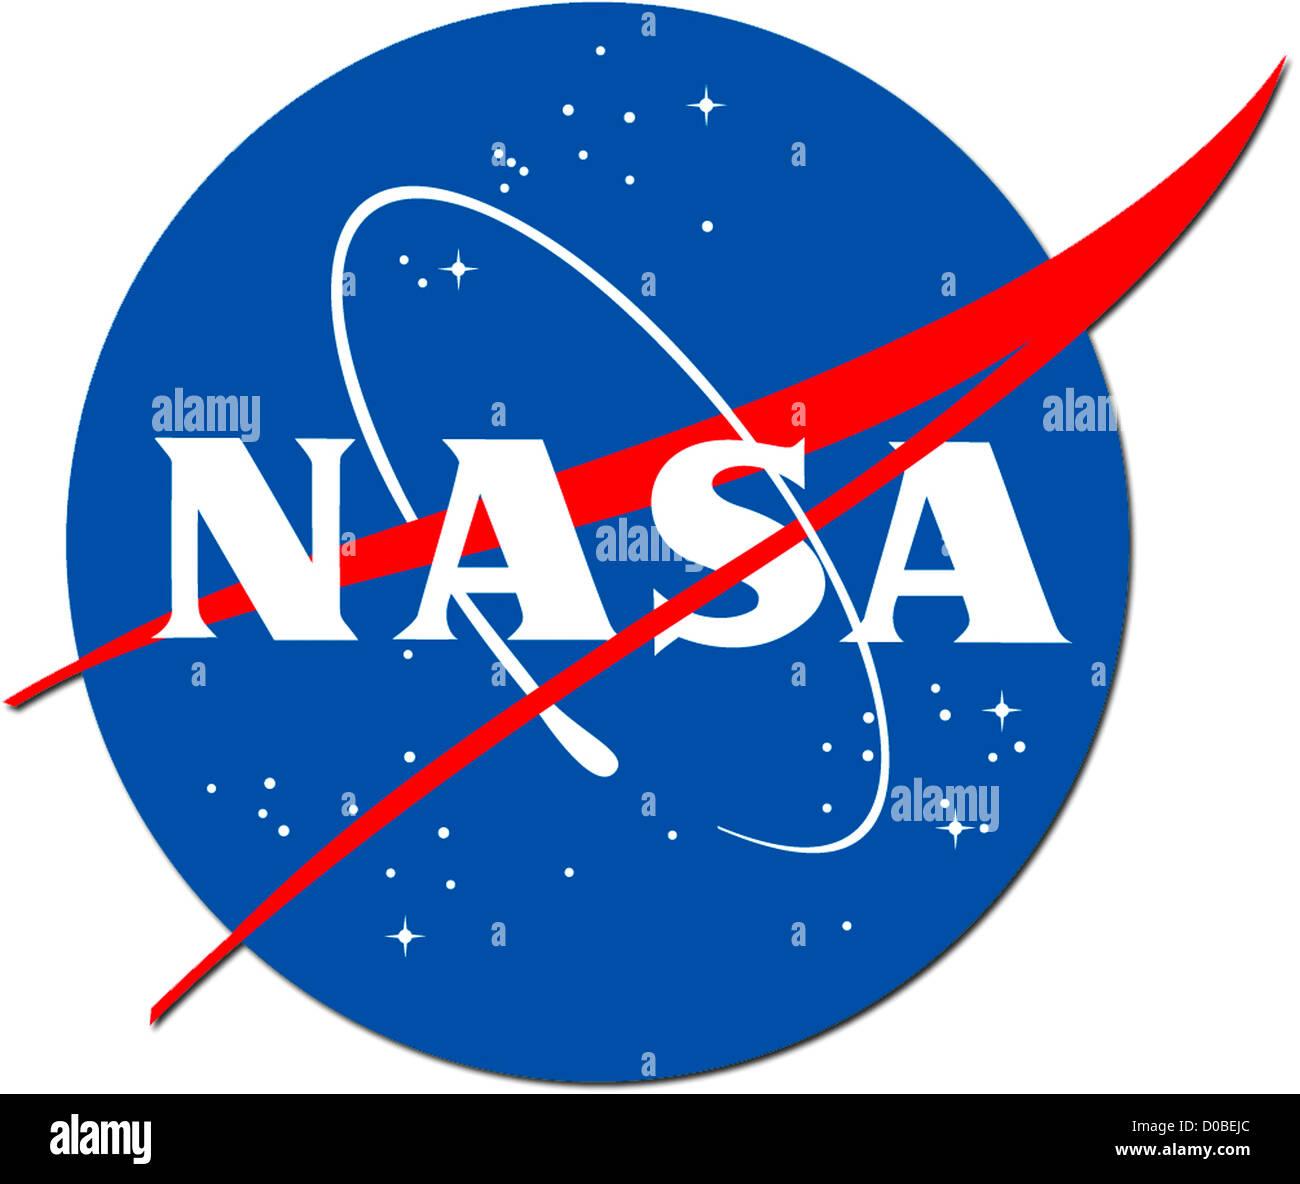 Logo of the company NASA - National Aeronautics and Space Administration. - Stock Image